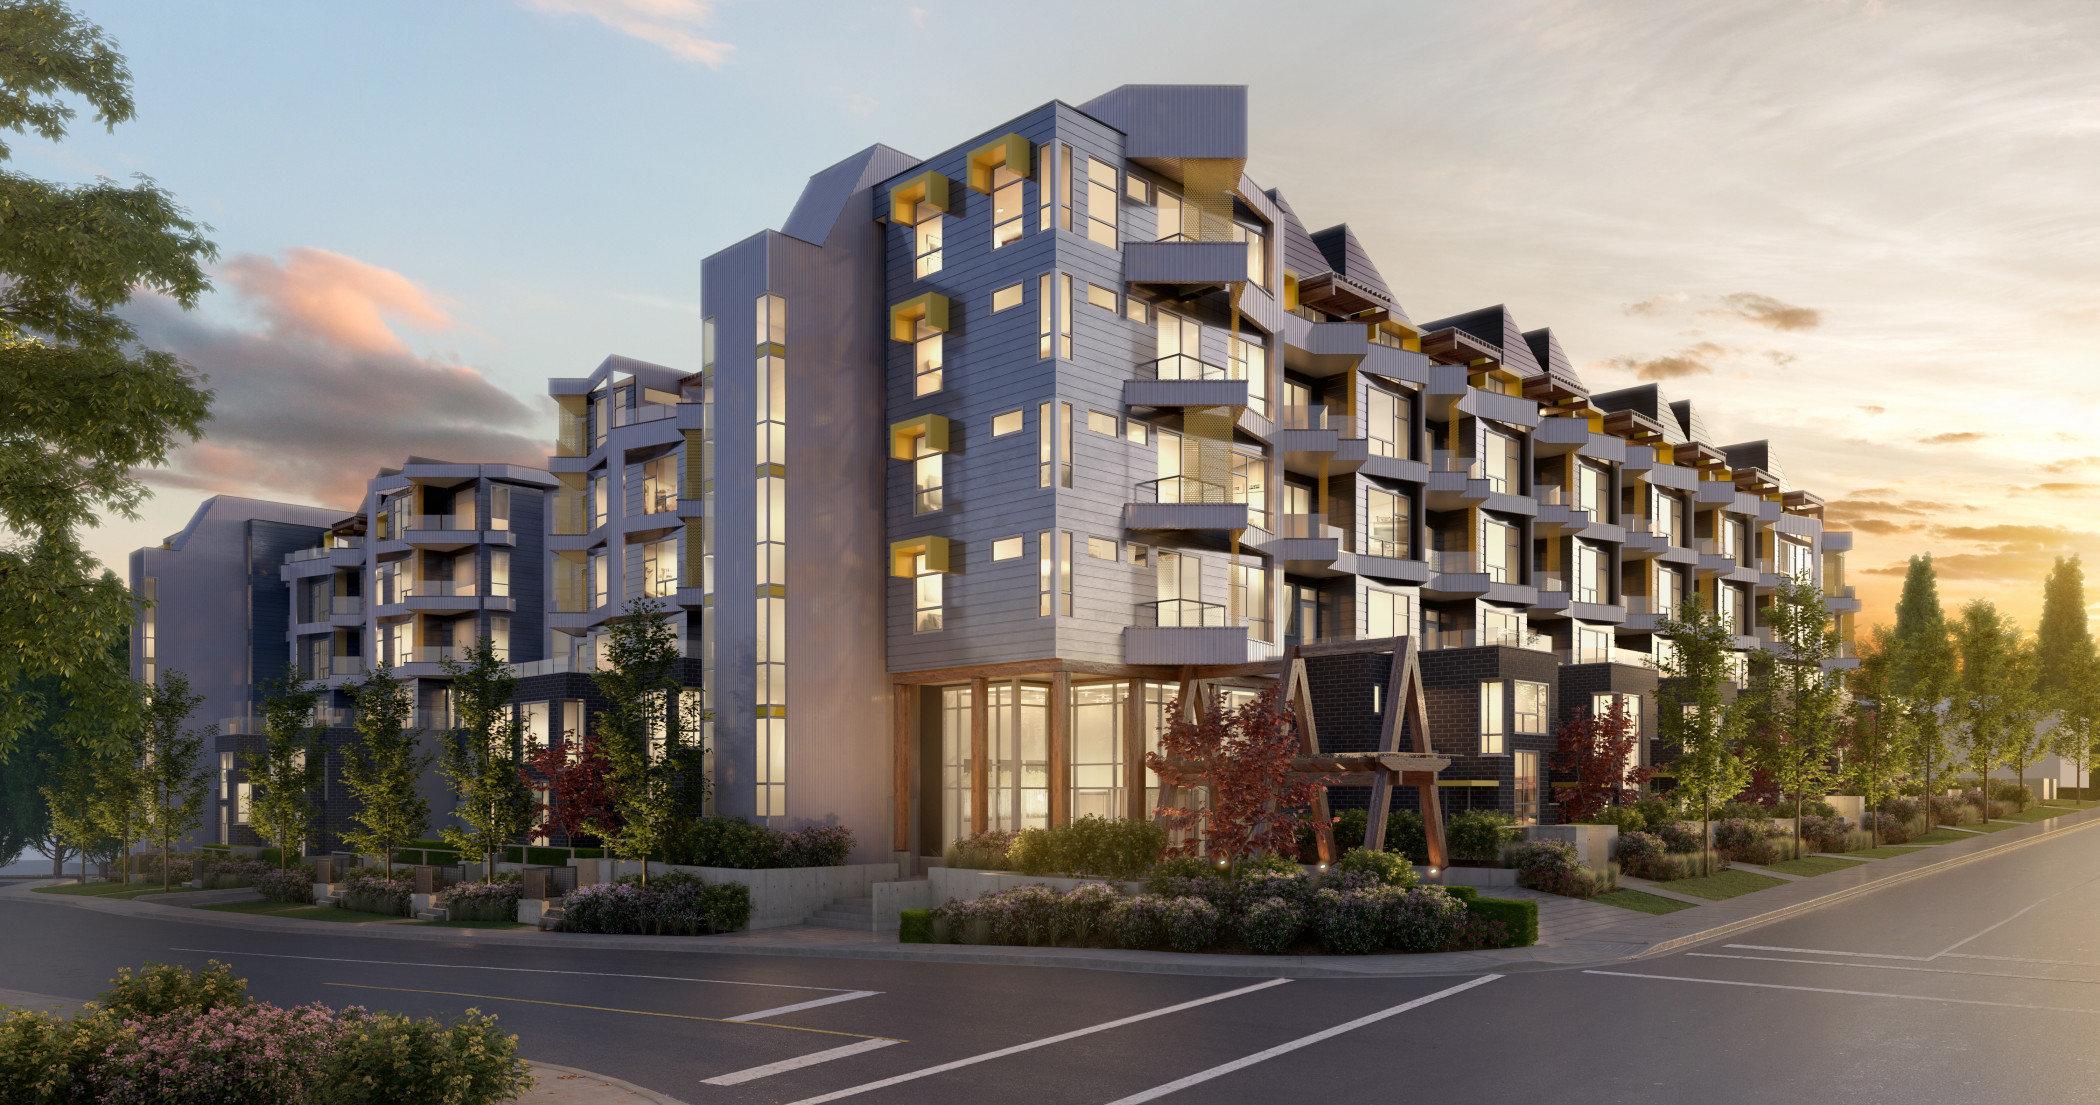 Building Exterior - 2814 Gladwin Rd, Abbotsford, BC V2T 4S8, Canada!